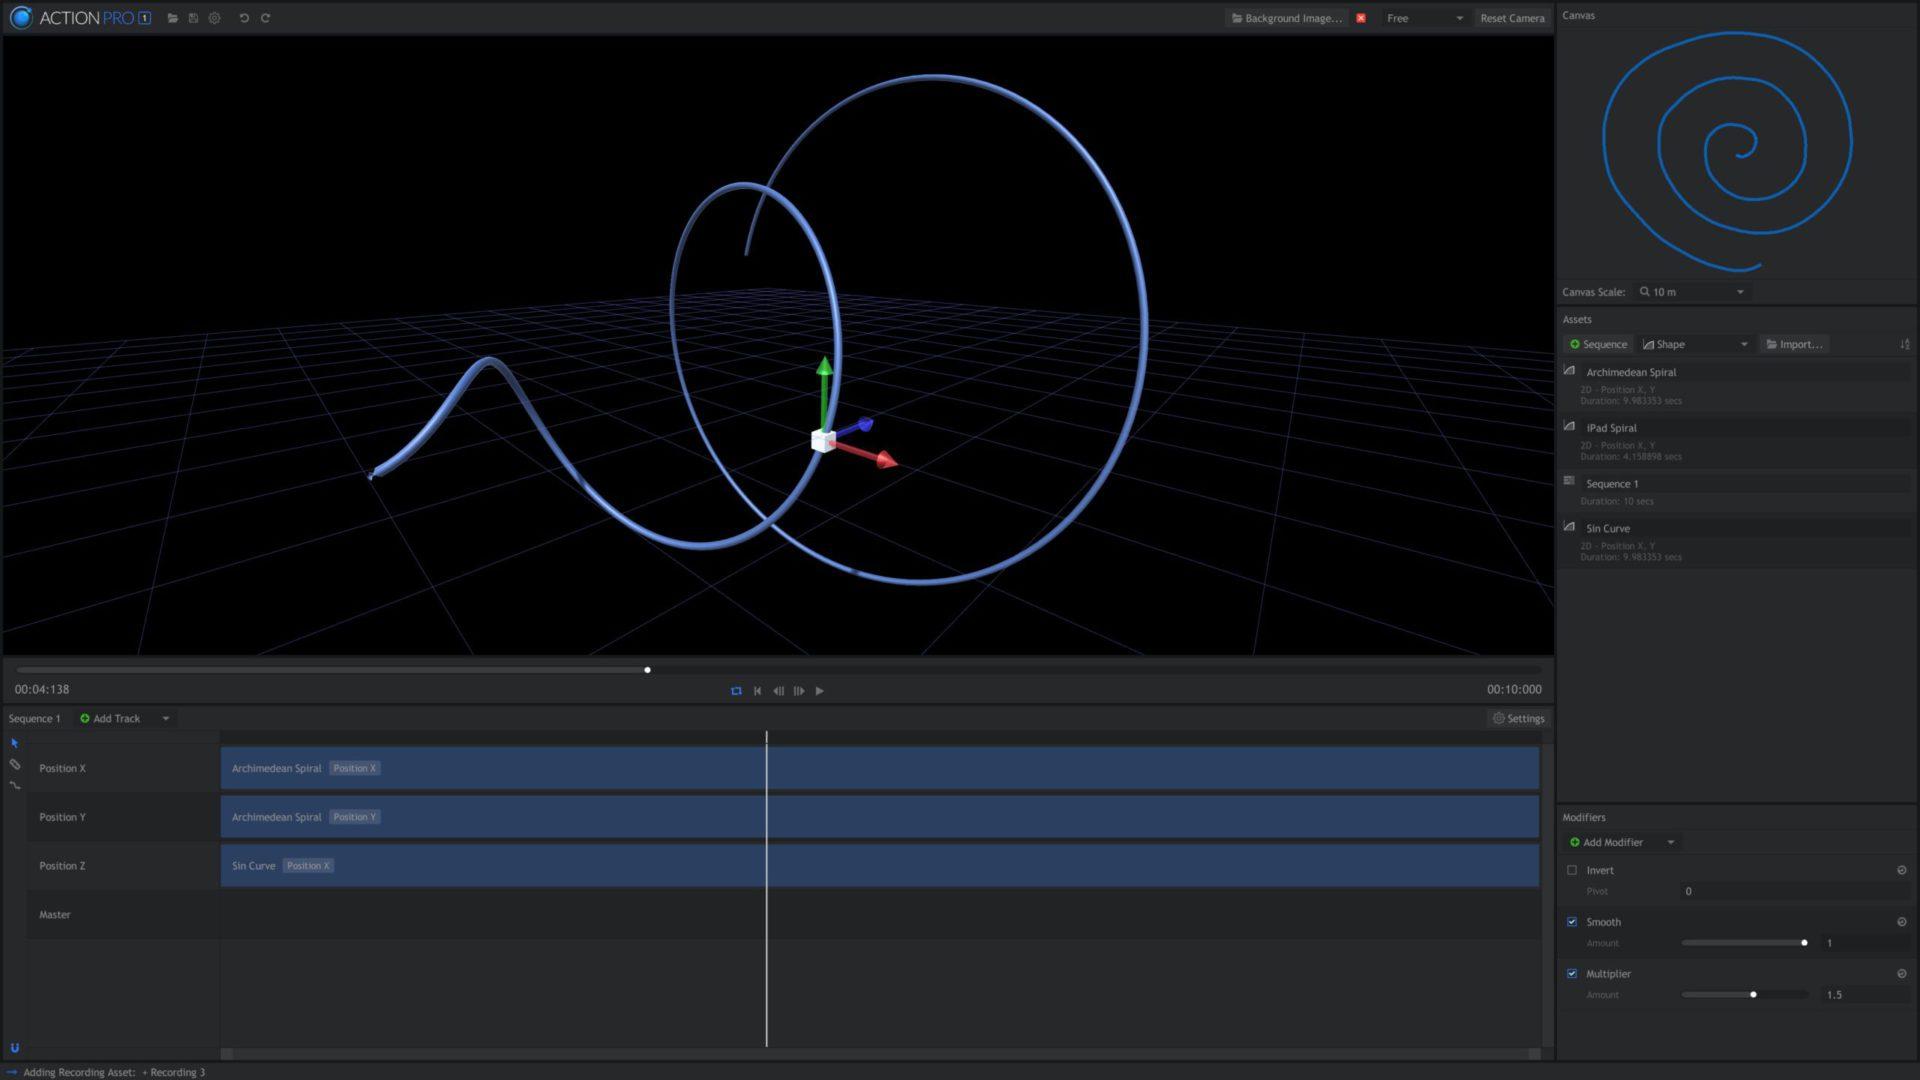 Action Pro interface - motion capture software